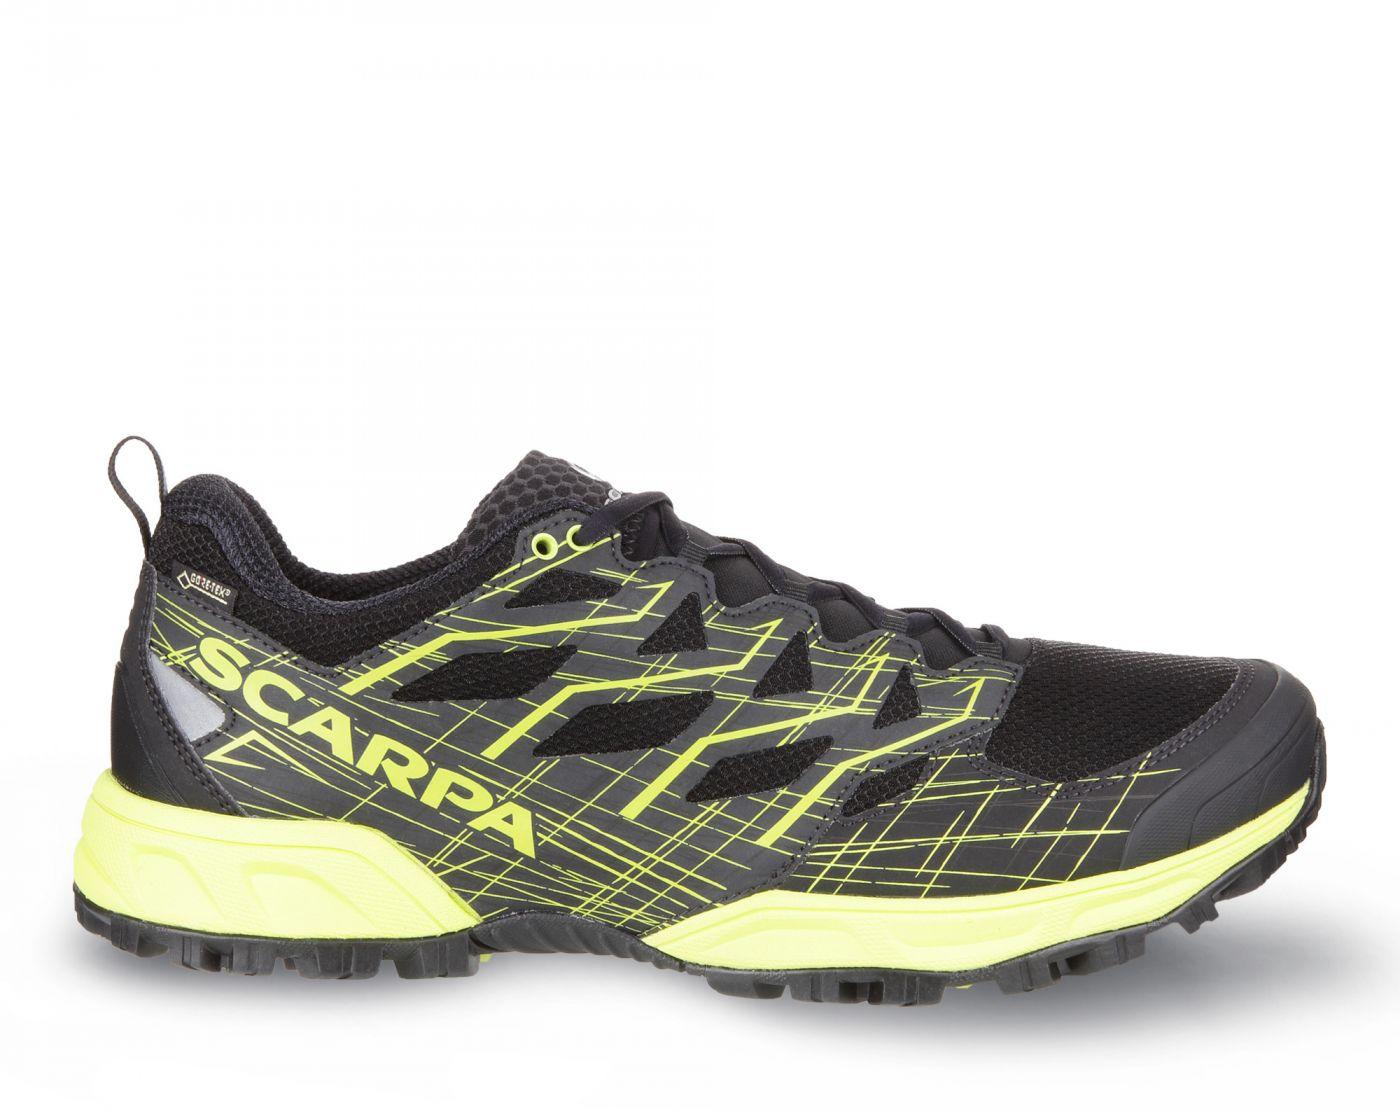 SCARPA Womens Neutron 2 Trail Running Shoe